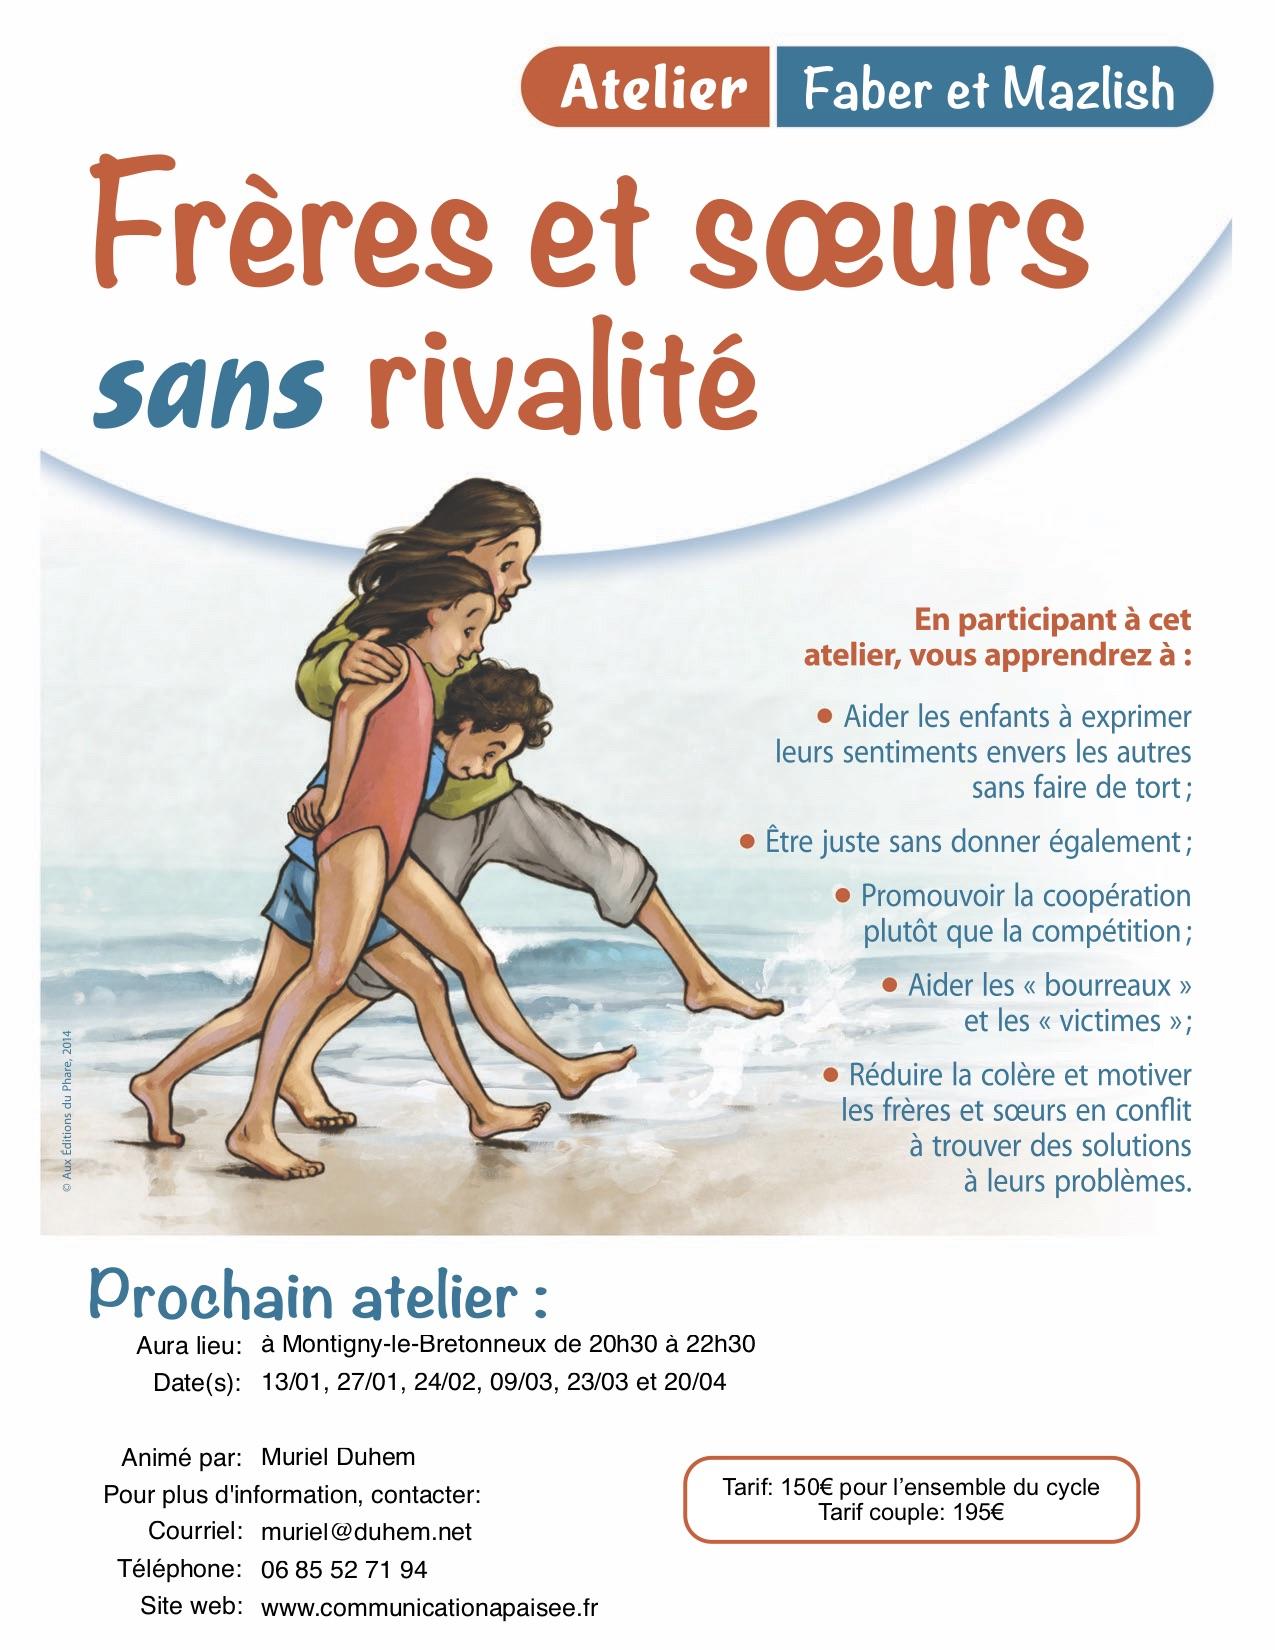 Rivalités Frères Soeurs Faber Mazlish 2020 Montigny